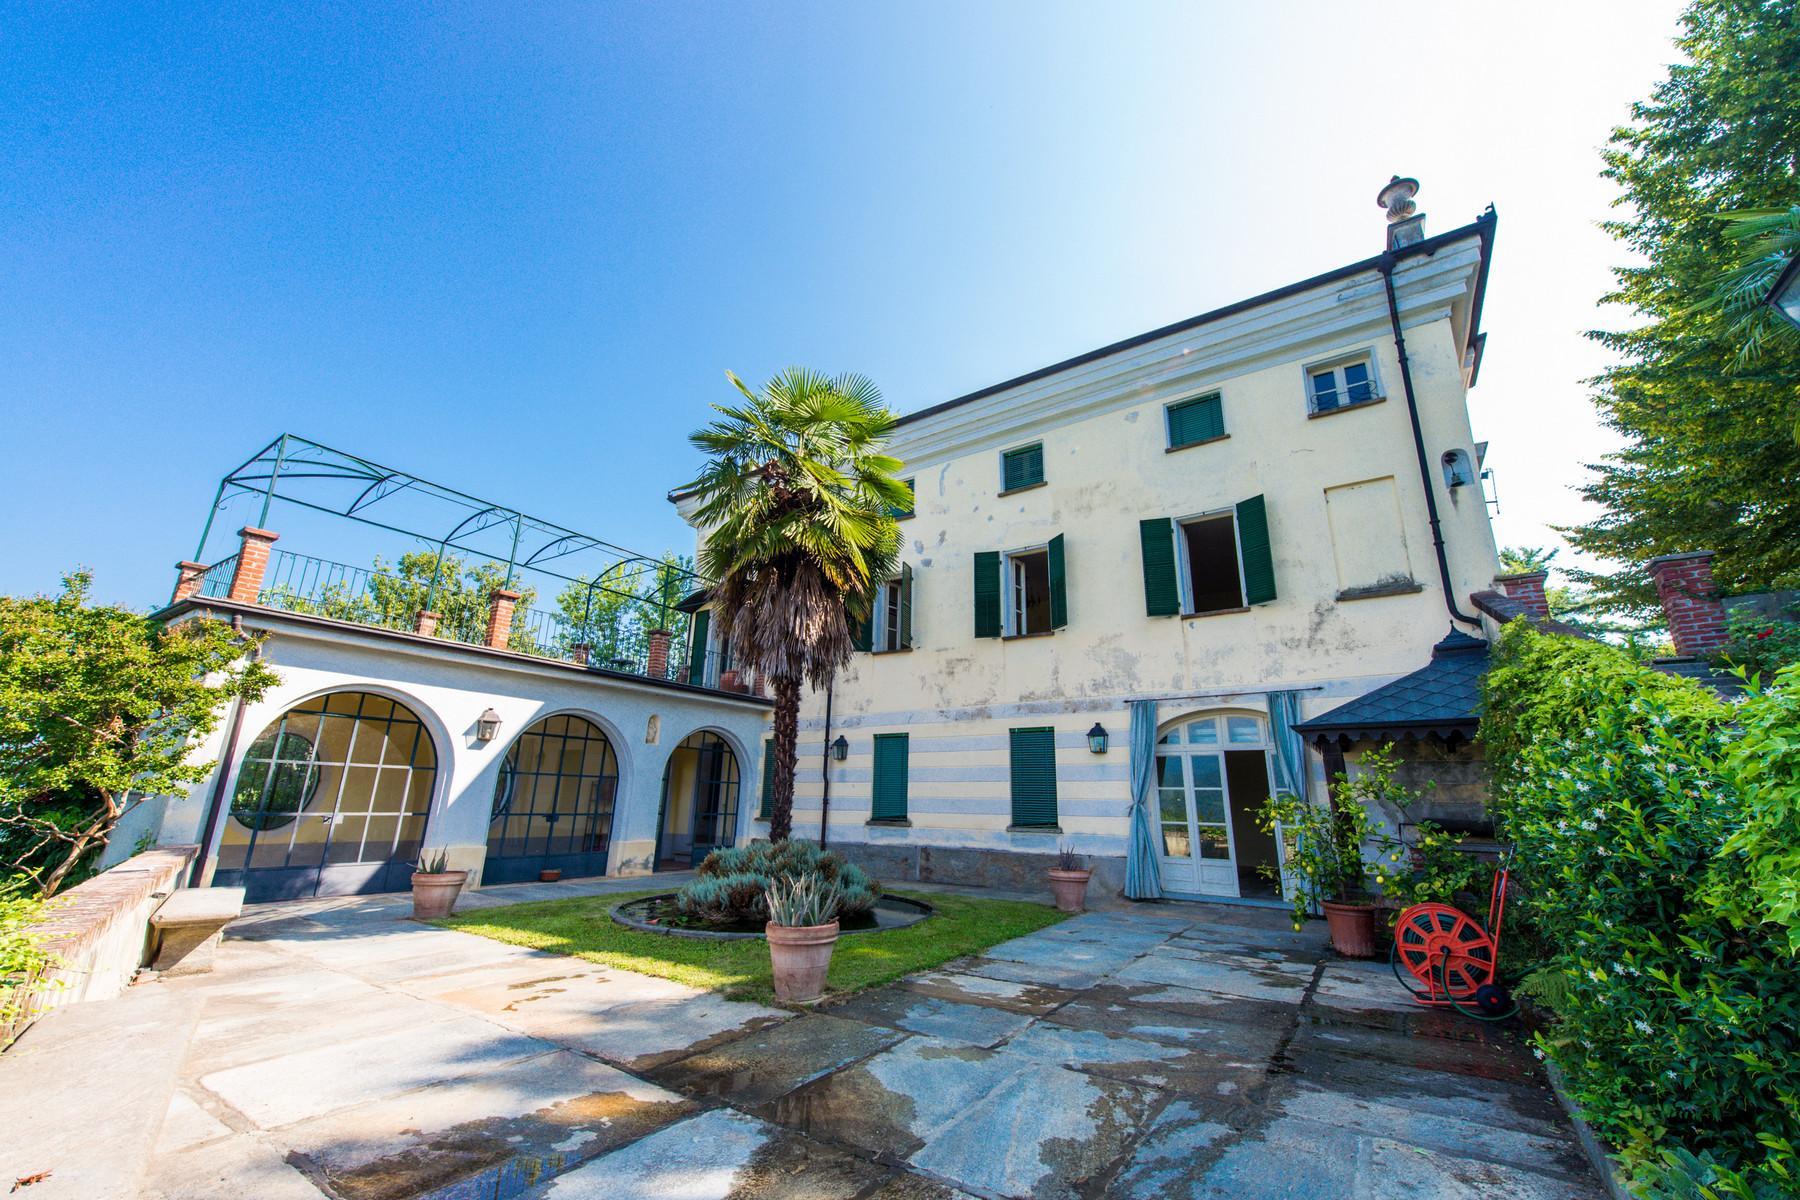 Splendid villa with winery in Piedmont - 24